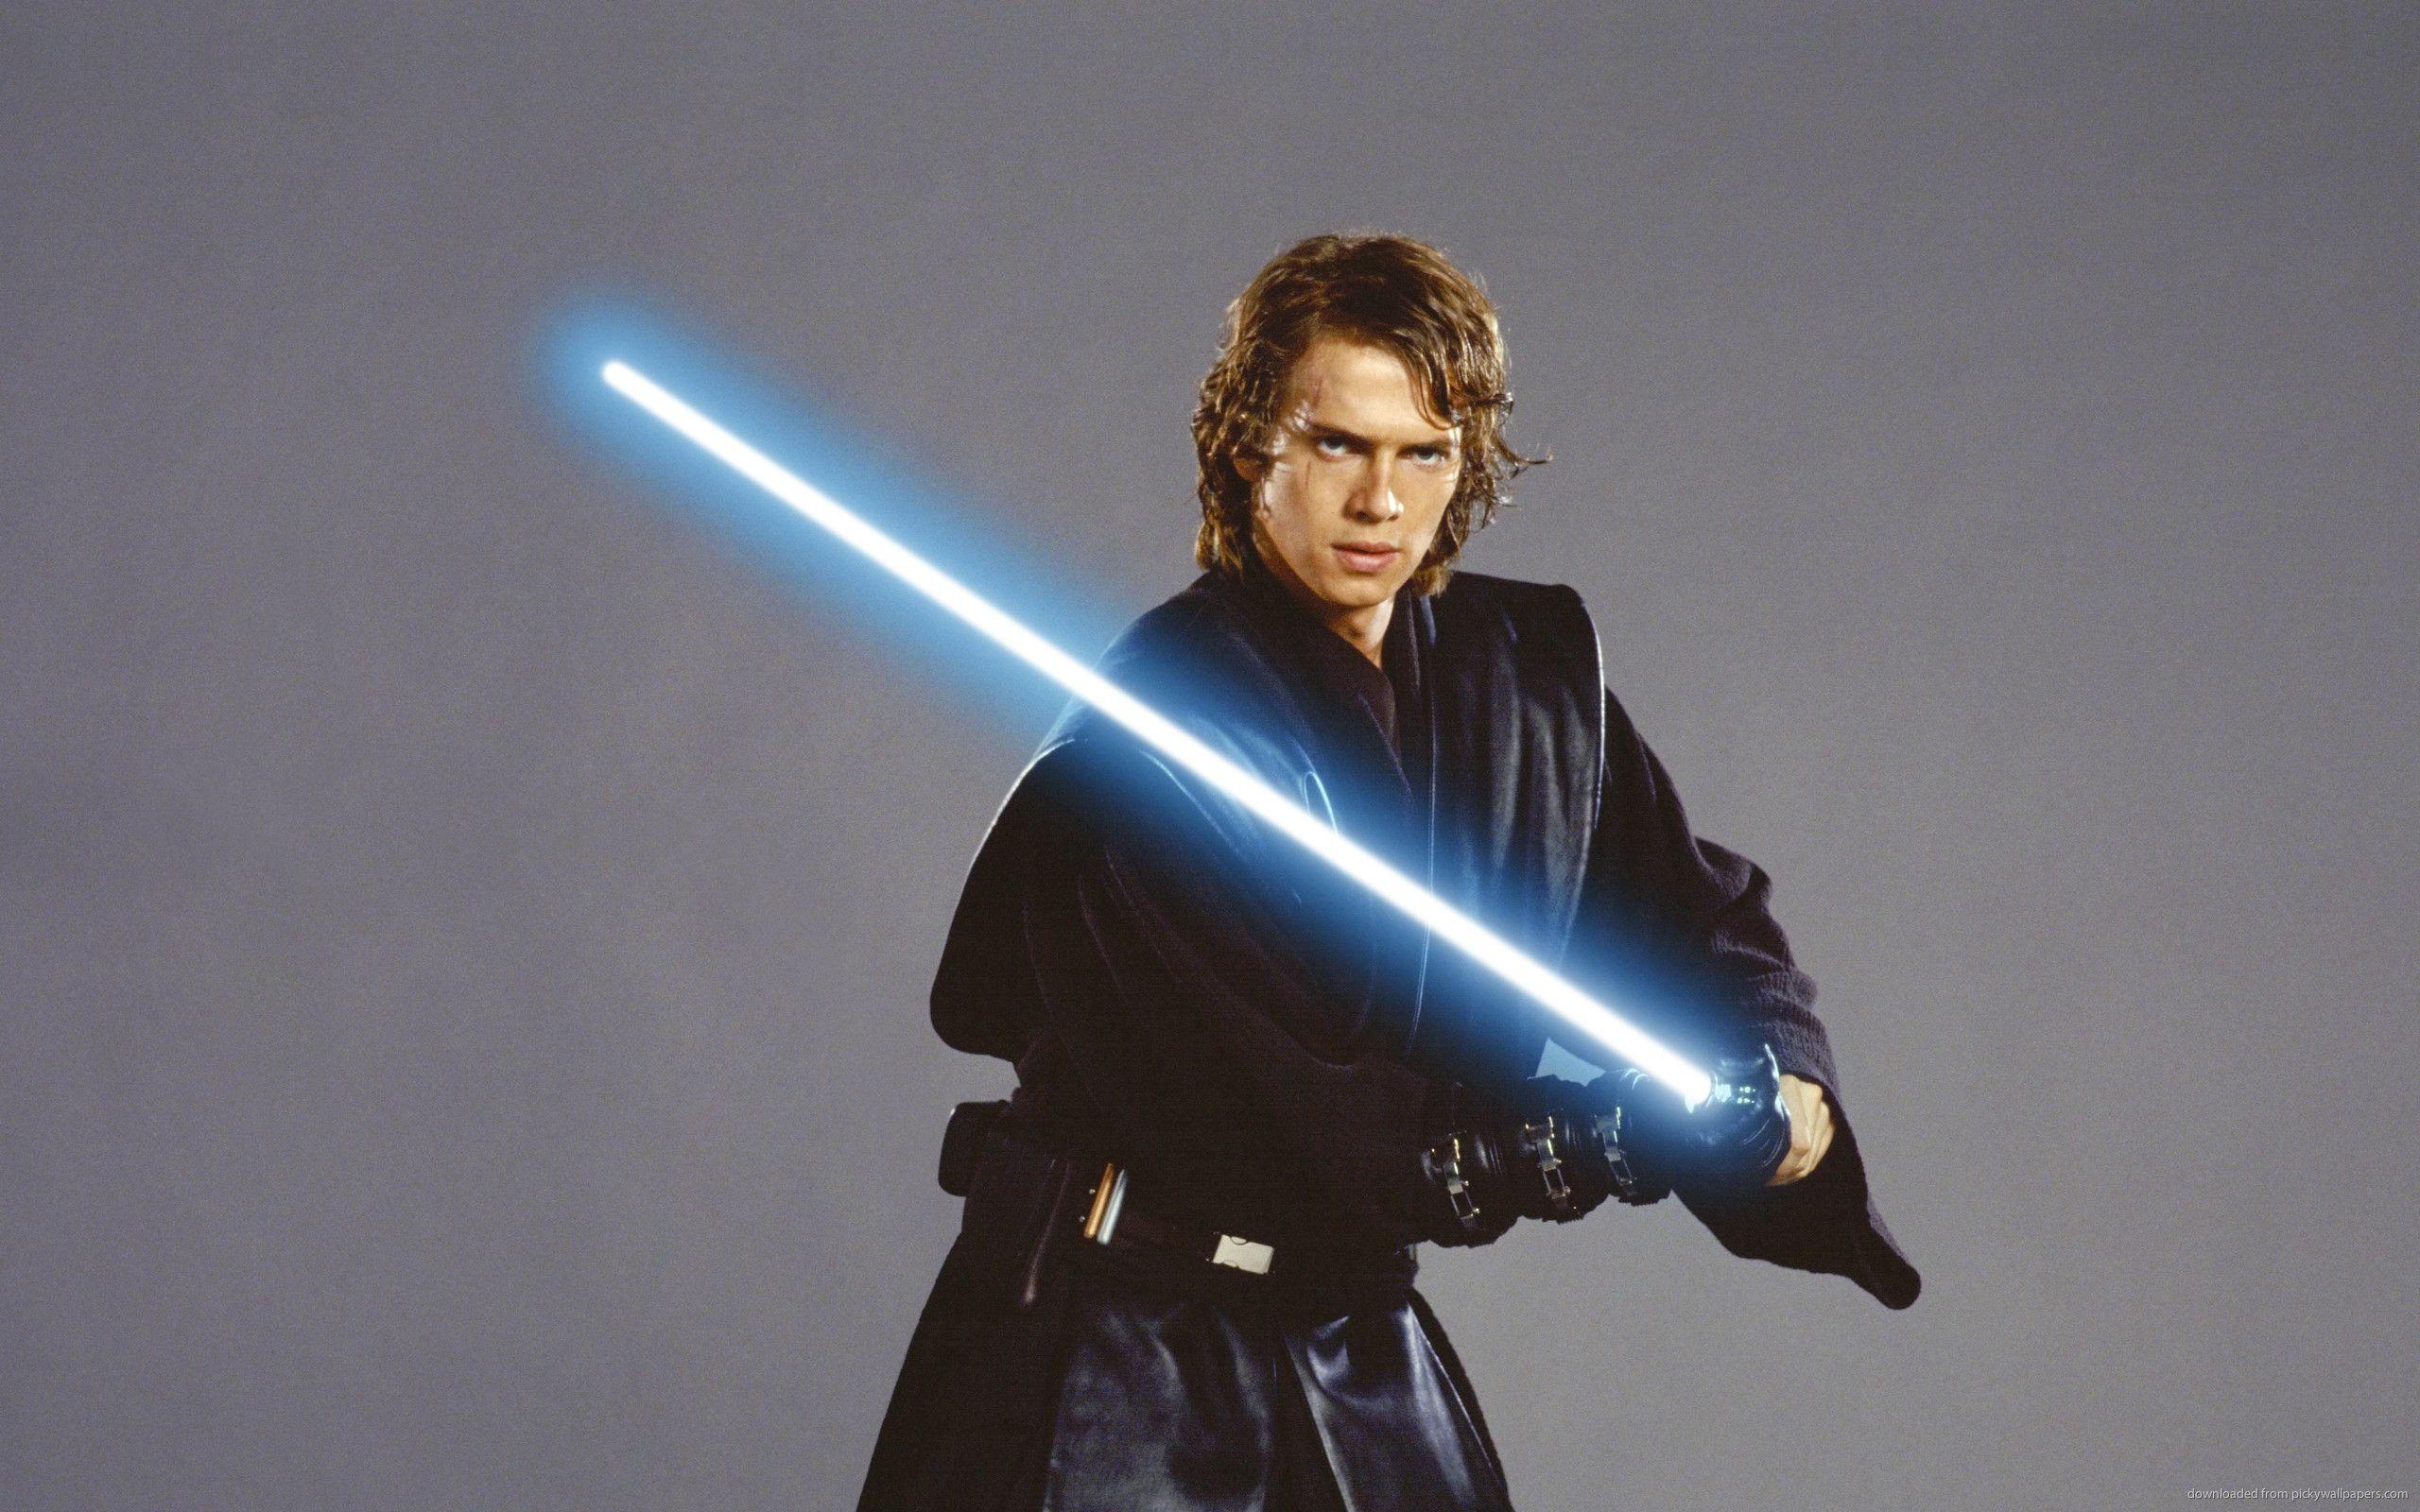 Anakin Skywalker Hd Wallpapers Top Free Anakin Skywalker Hd Backgrounds Wallpaperaccess